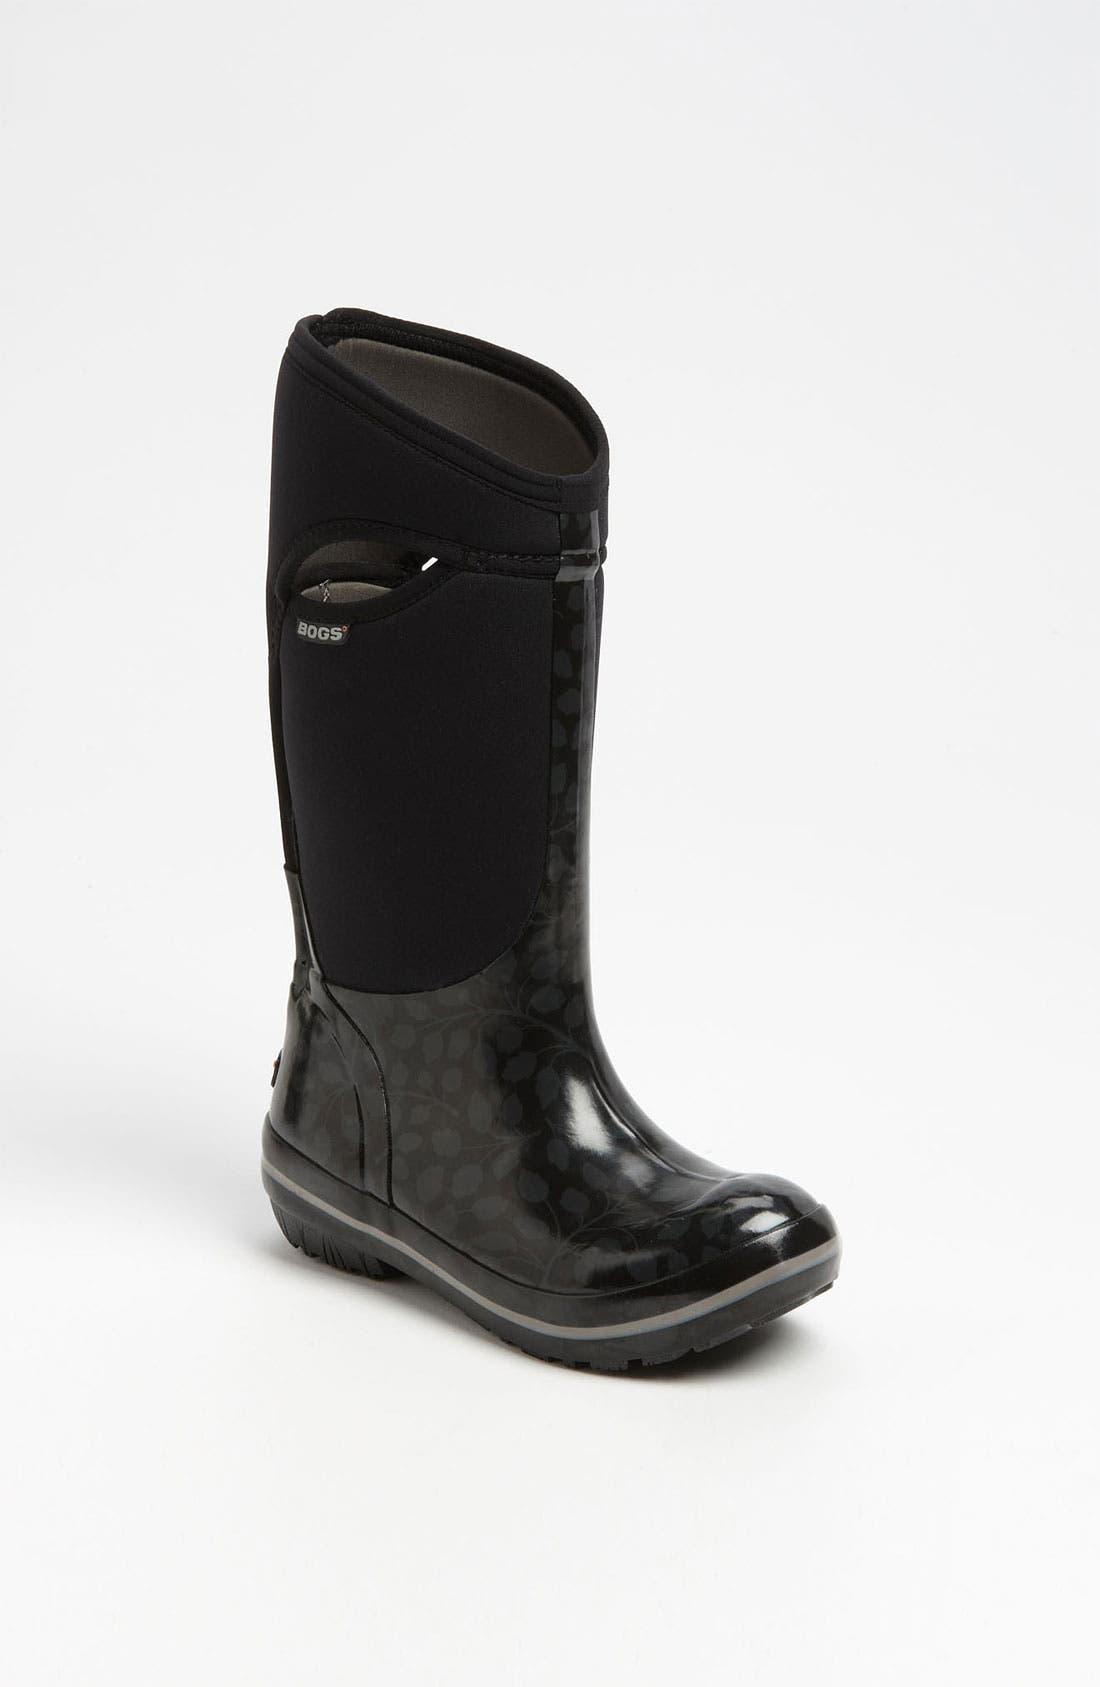 Main Image - Bogs 'Plimsoll Tall Leaf' Rain Boot (Women)